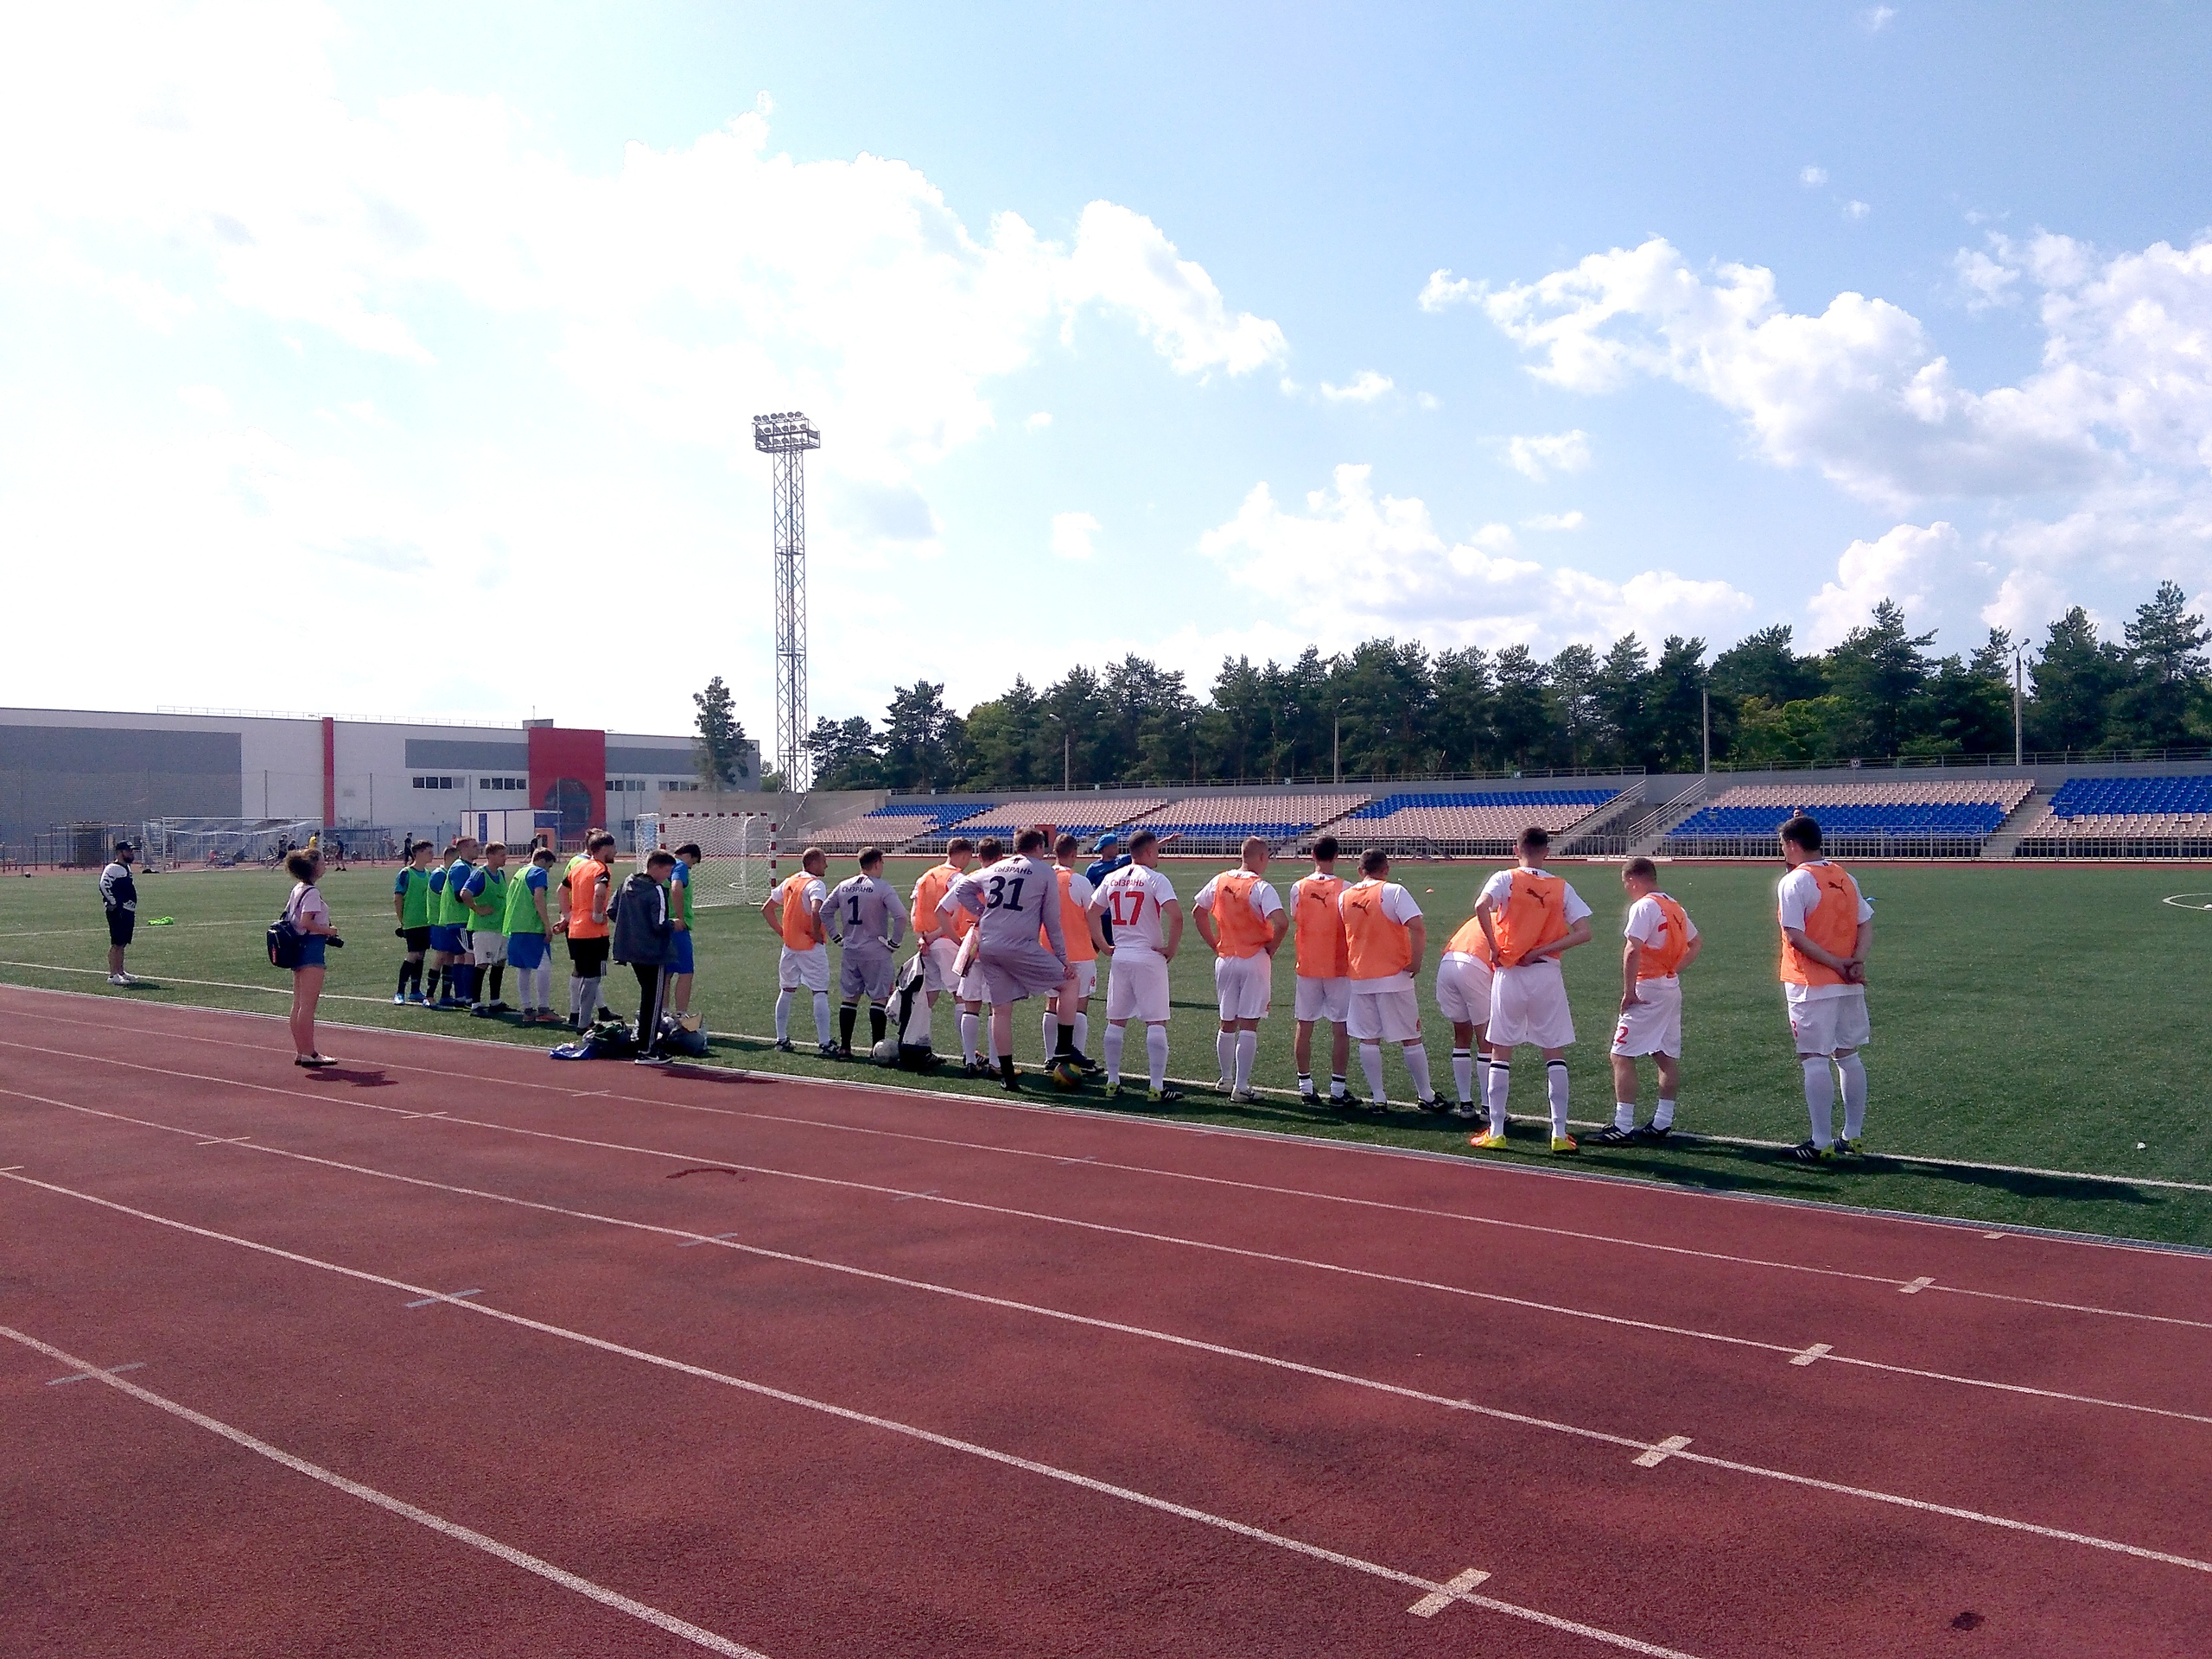 ФК КПРФ Сызрань открыл турнир по мини-футболу 2020